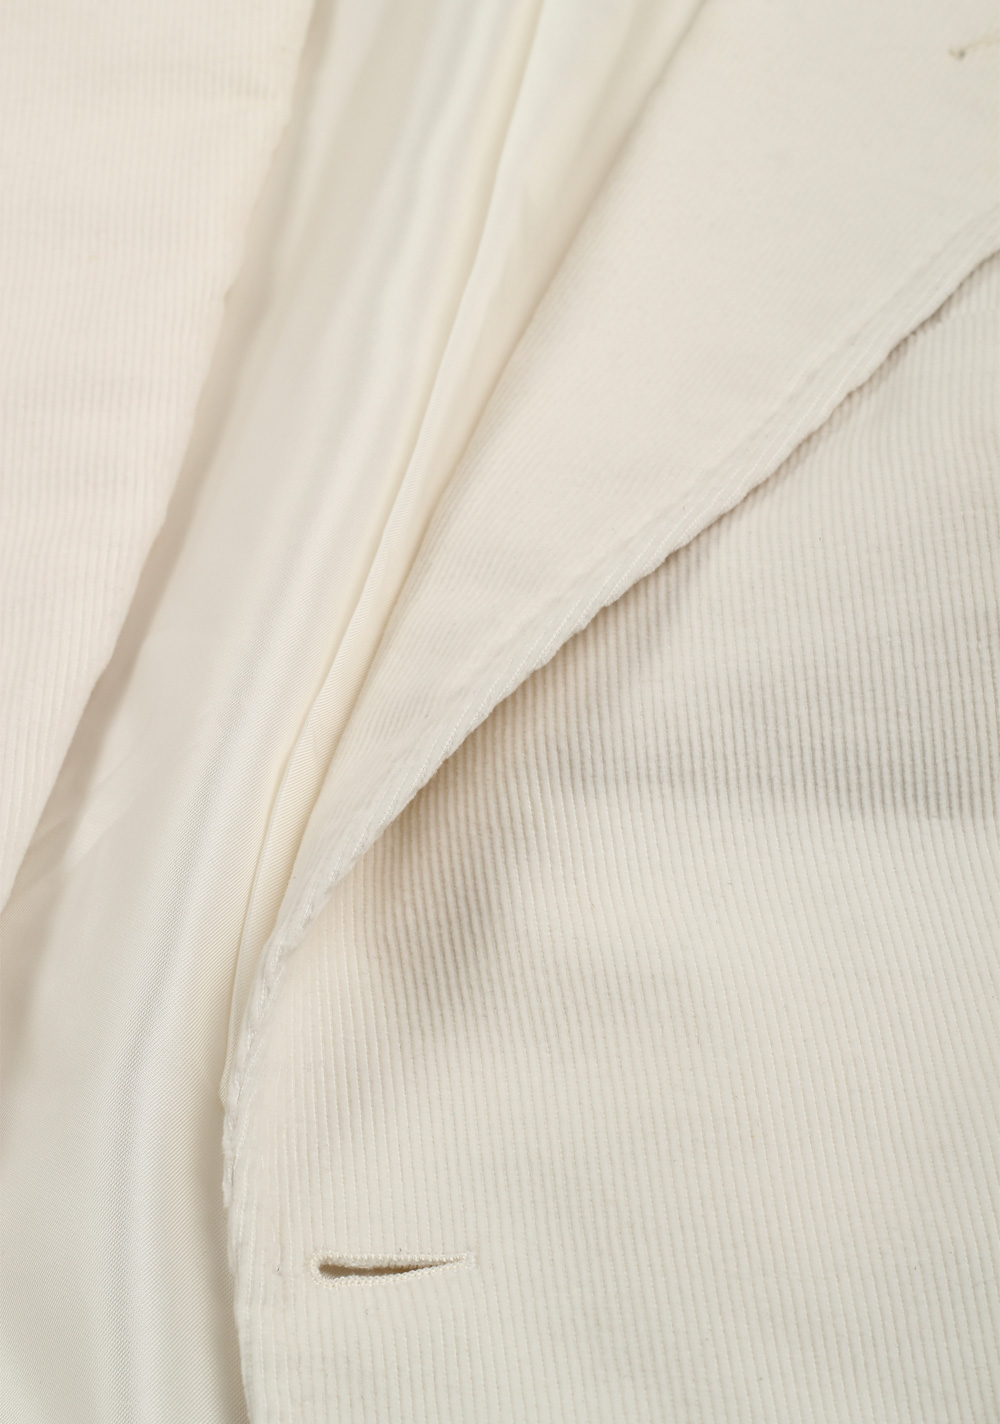 TOM FORD Shelton Off White Sport Coat Size 48 / 38R U.S. In Cotton Linen   Costume Limité